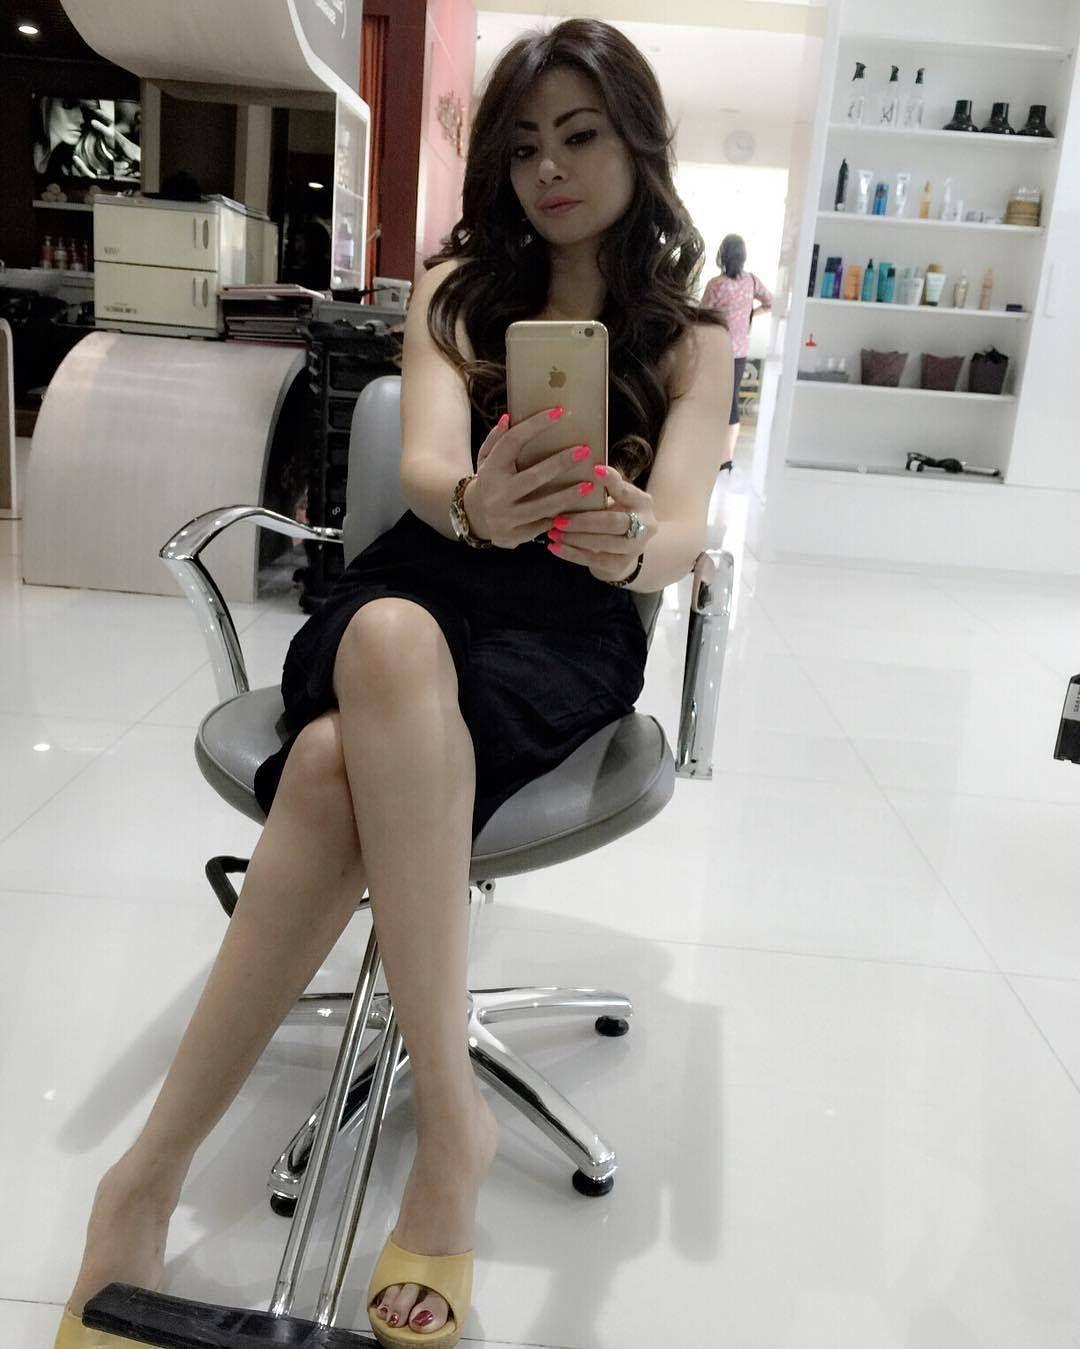 Asia milf pics